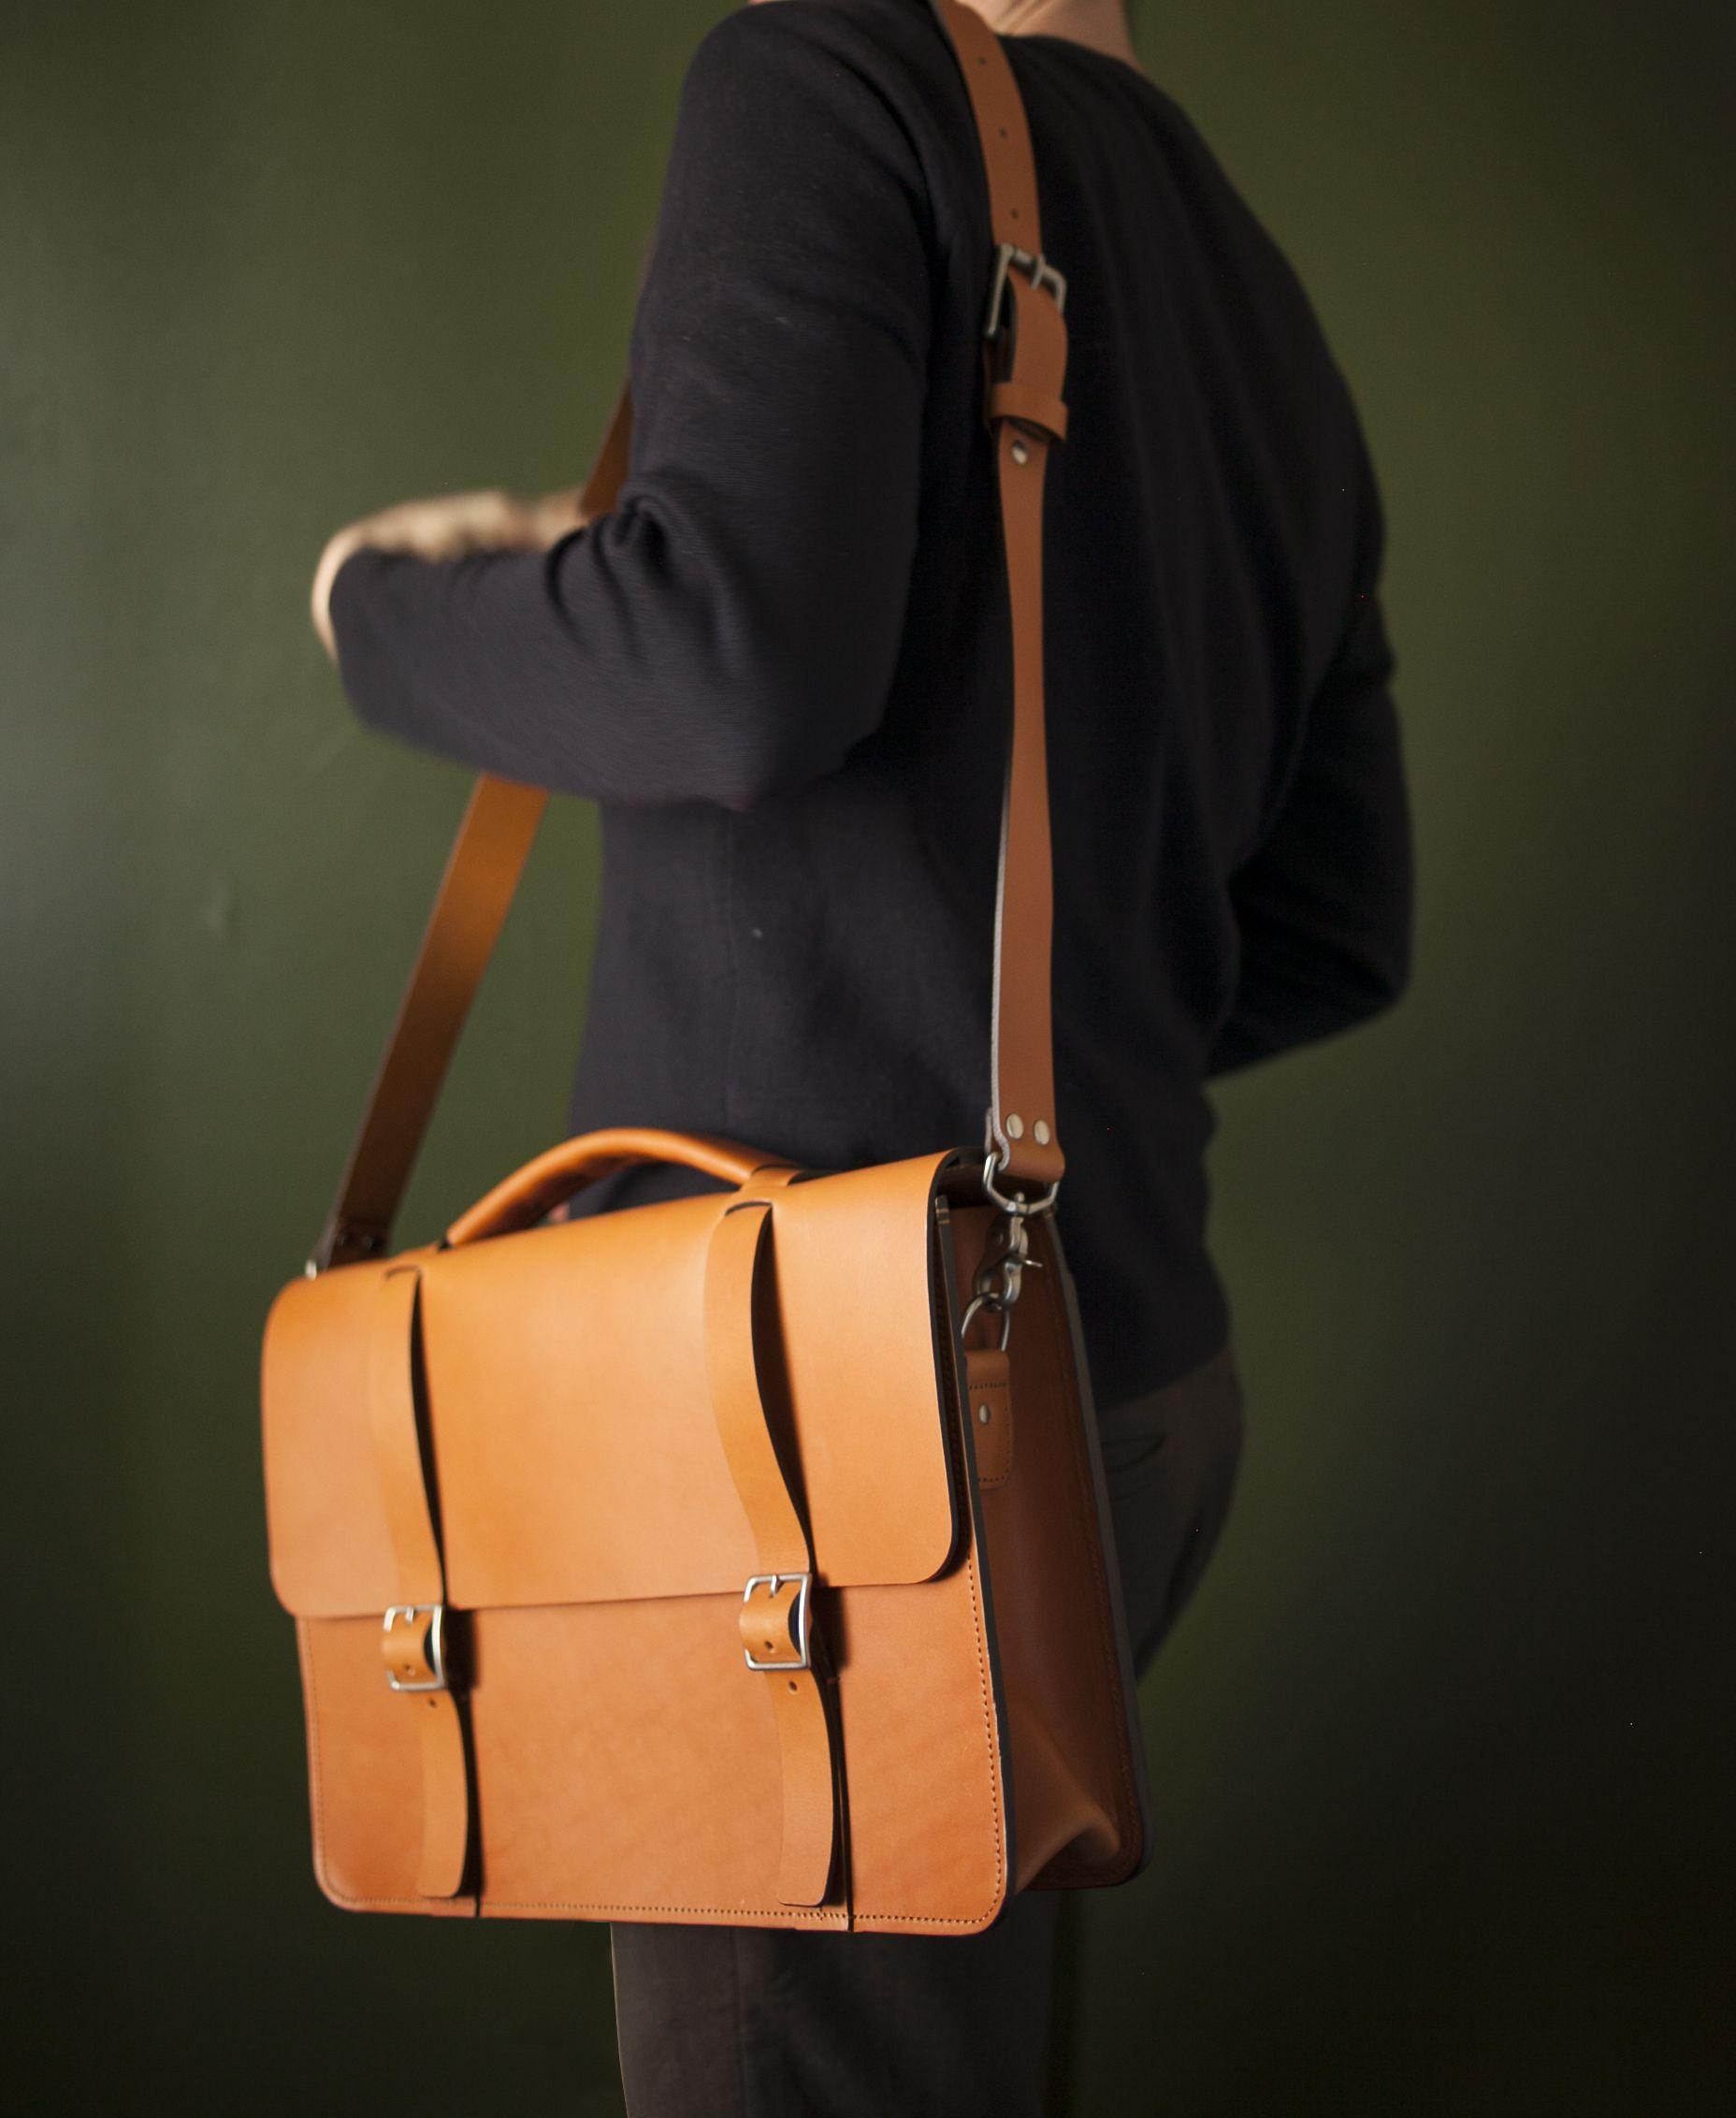 3f0aeaee407ba Handmade Classic Messenger Bag with divided Gusset - English Tan ...